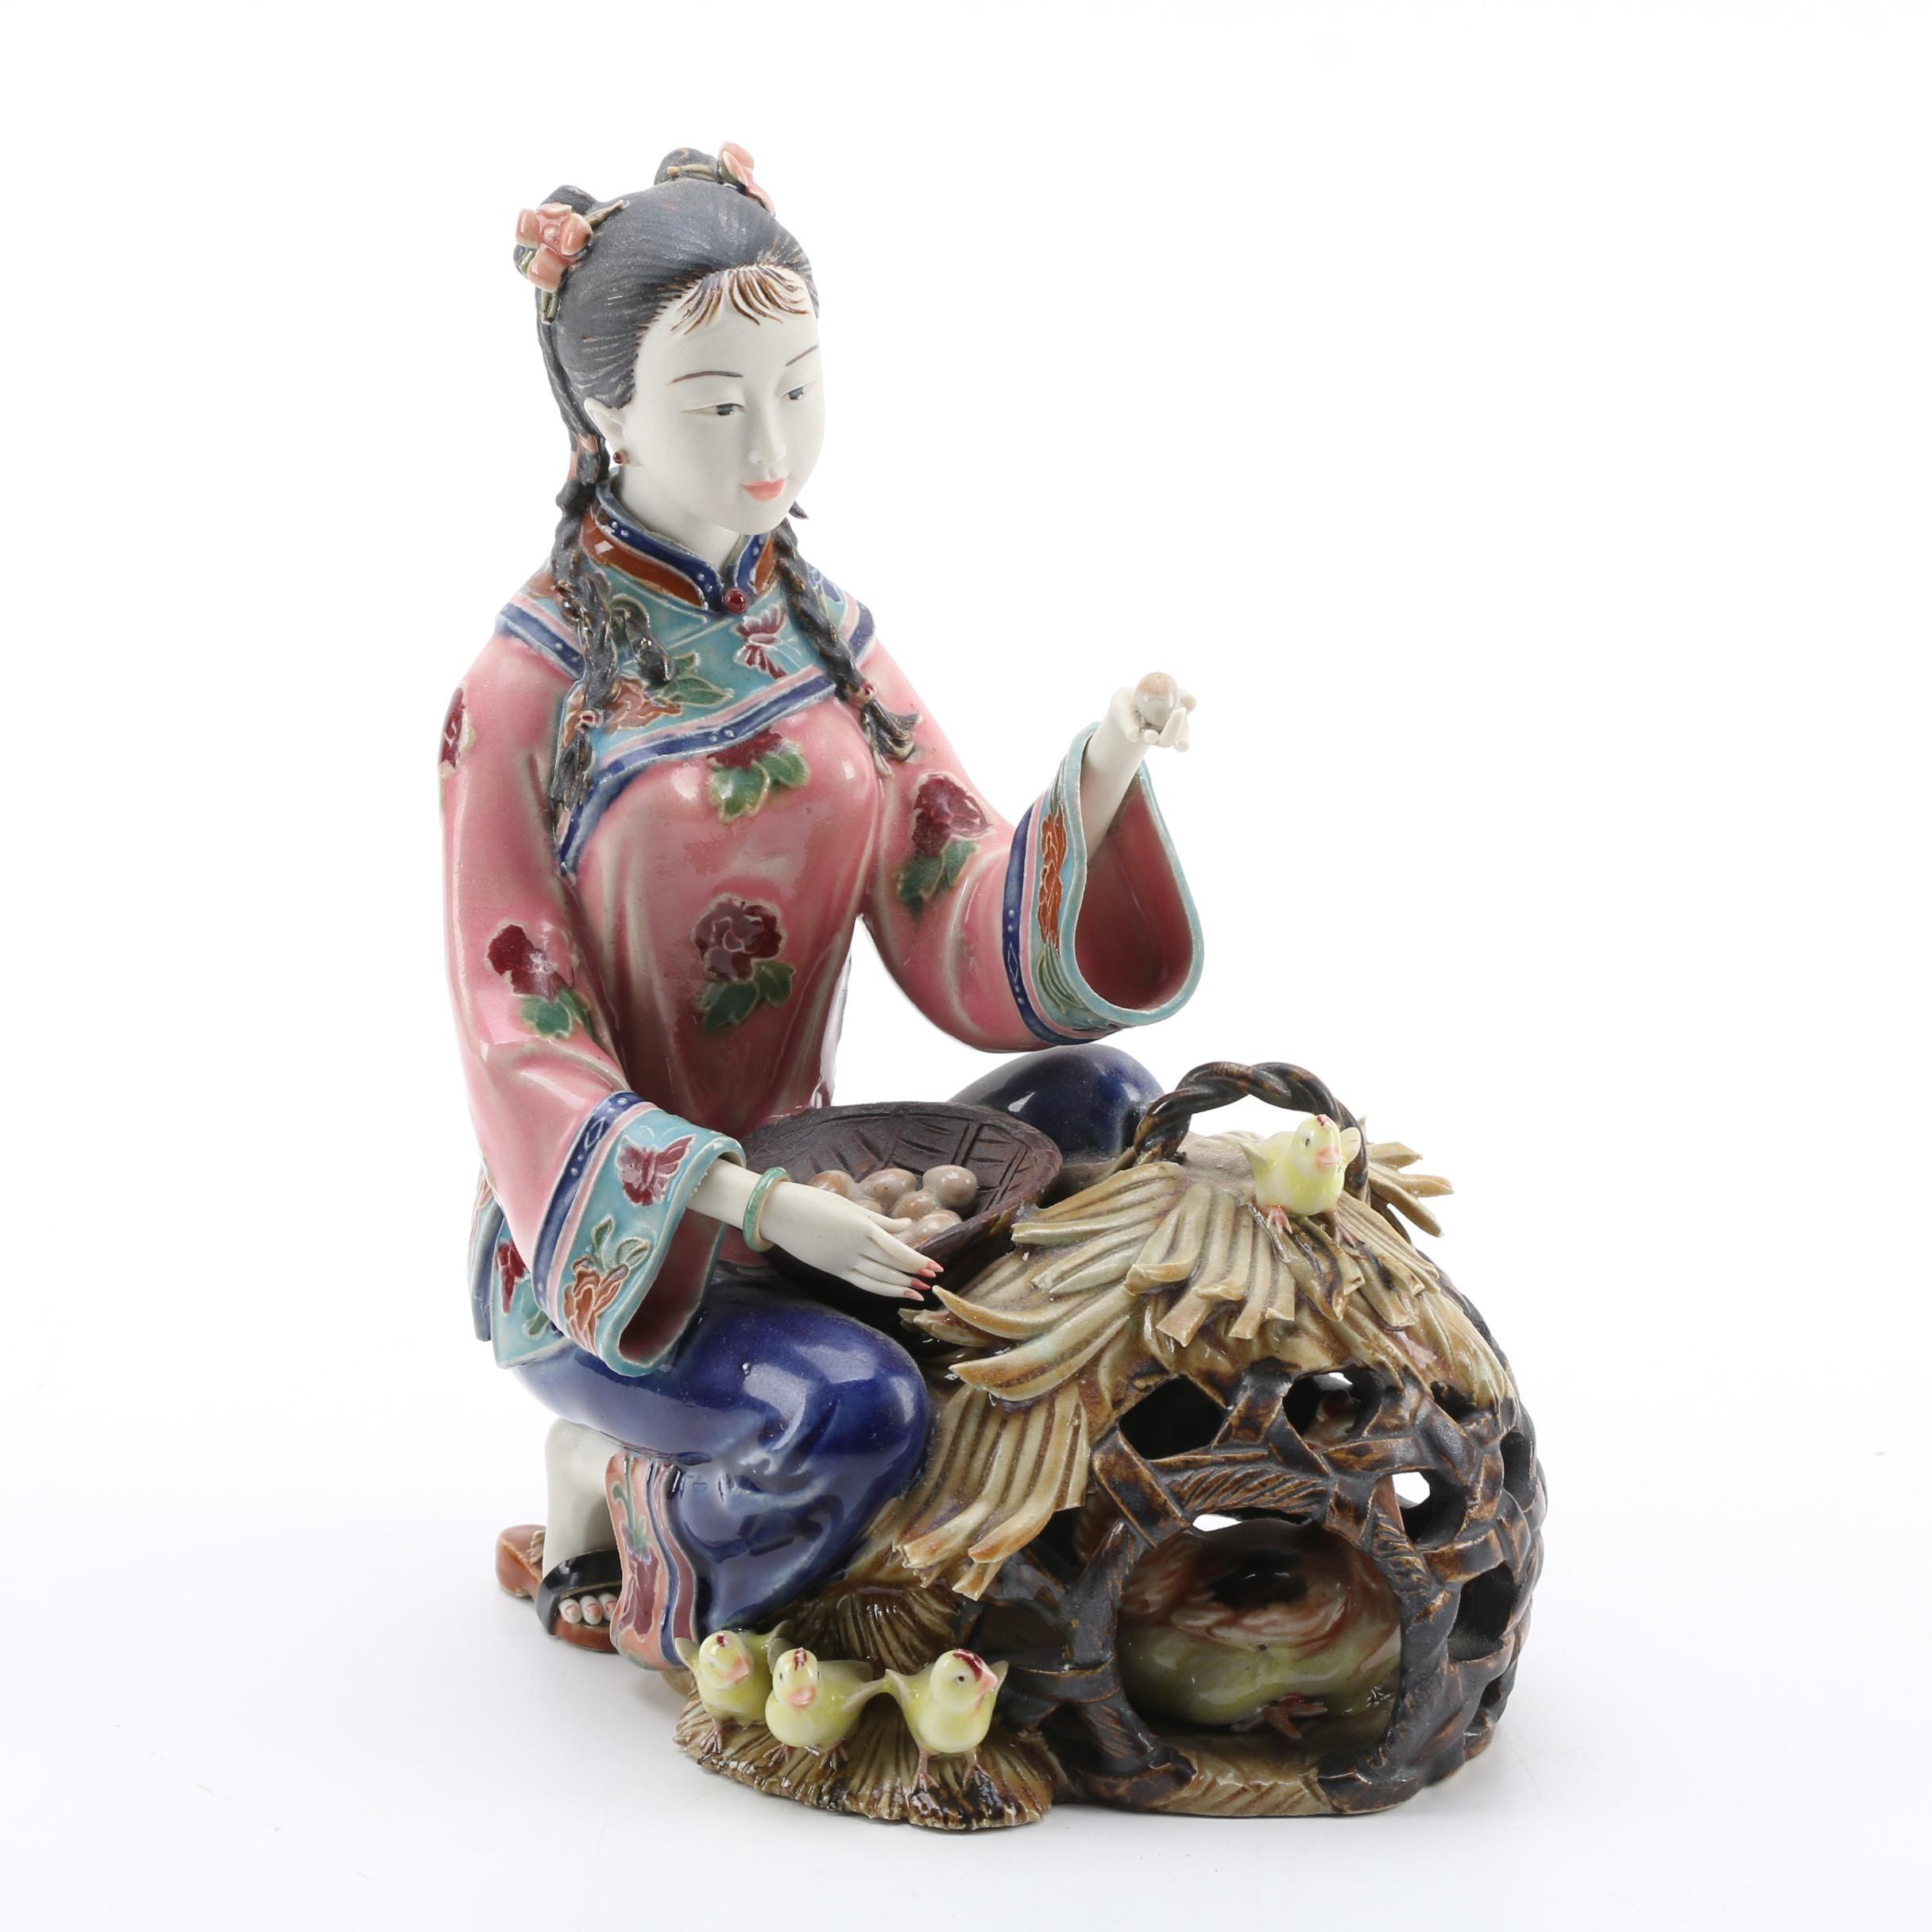 Chinese Female Ceramic Figurine